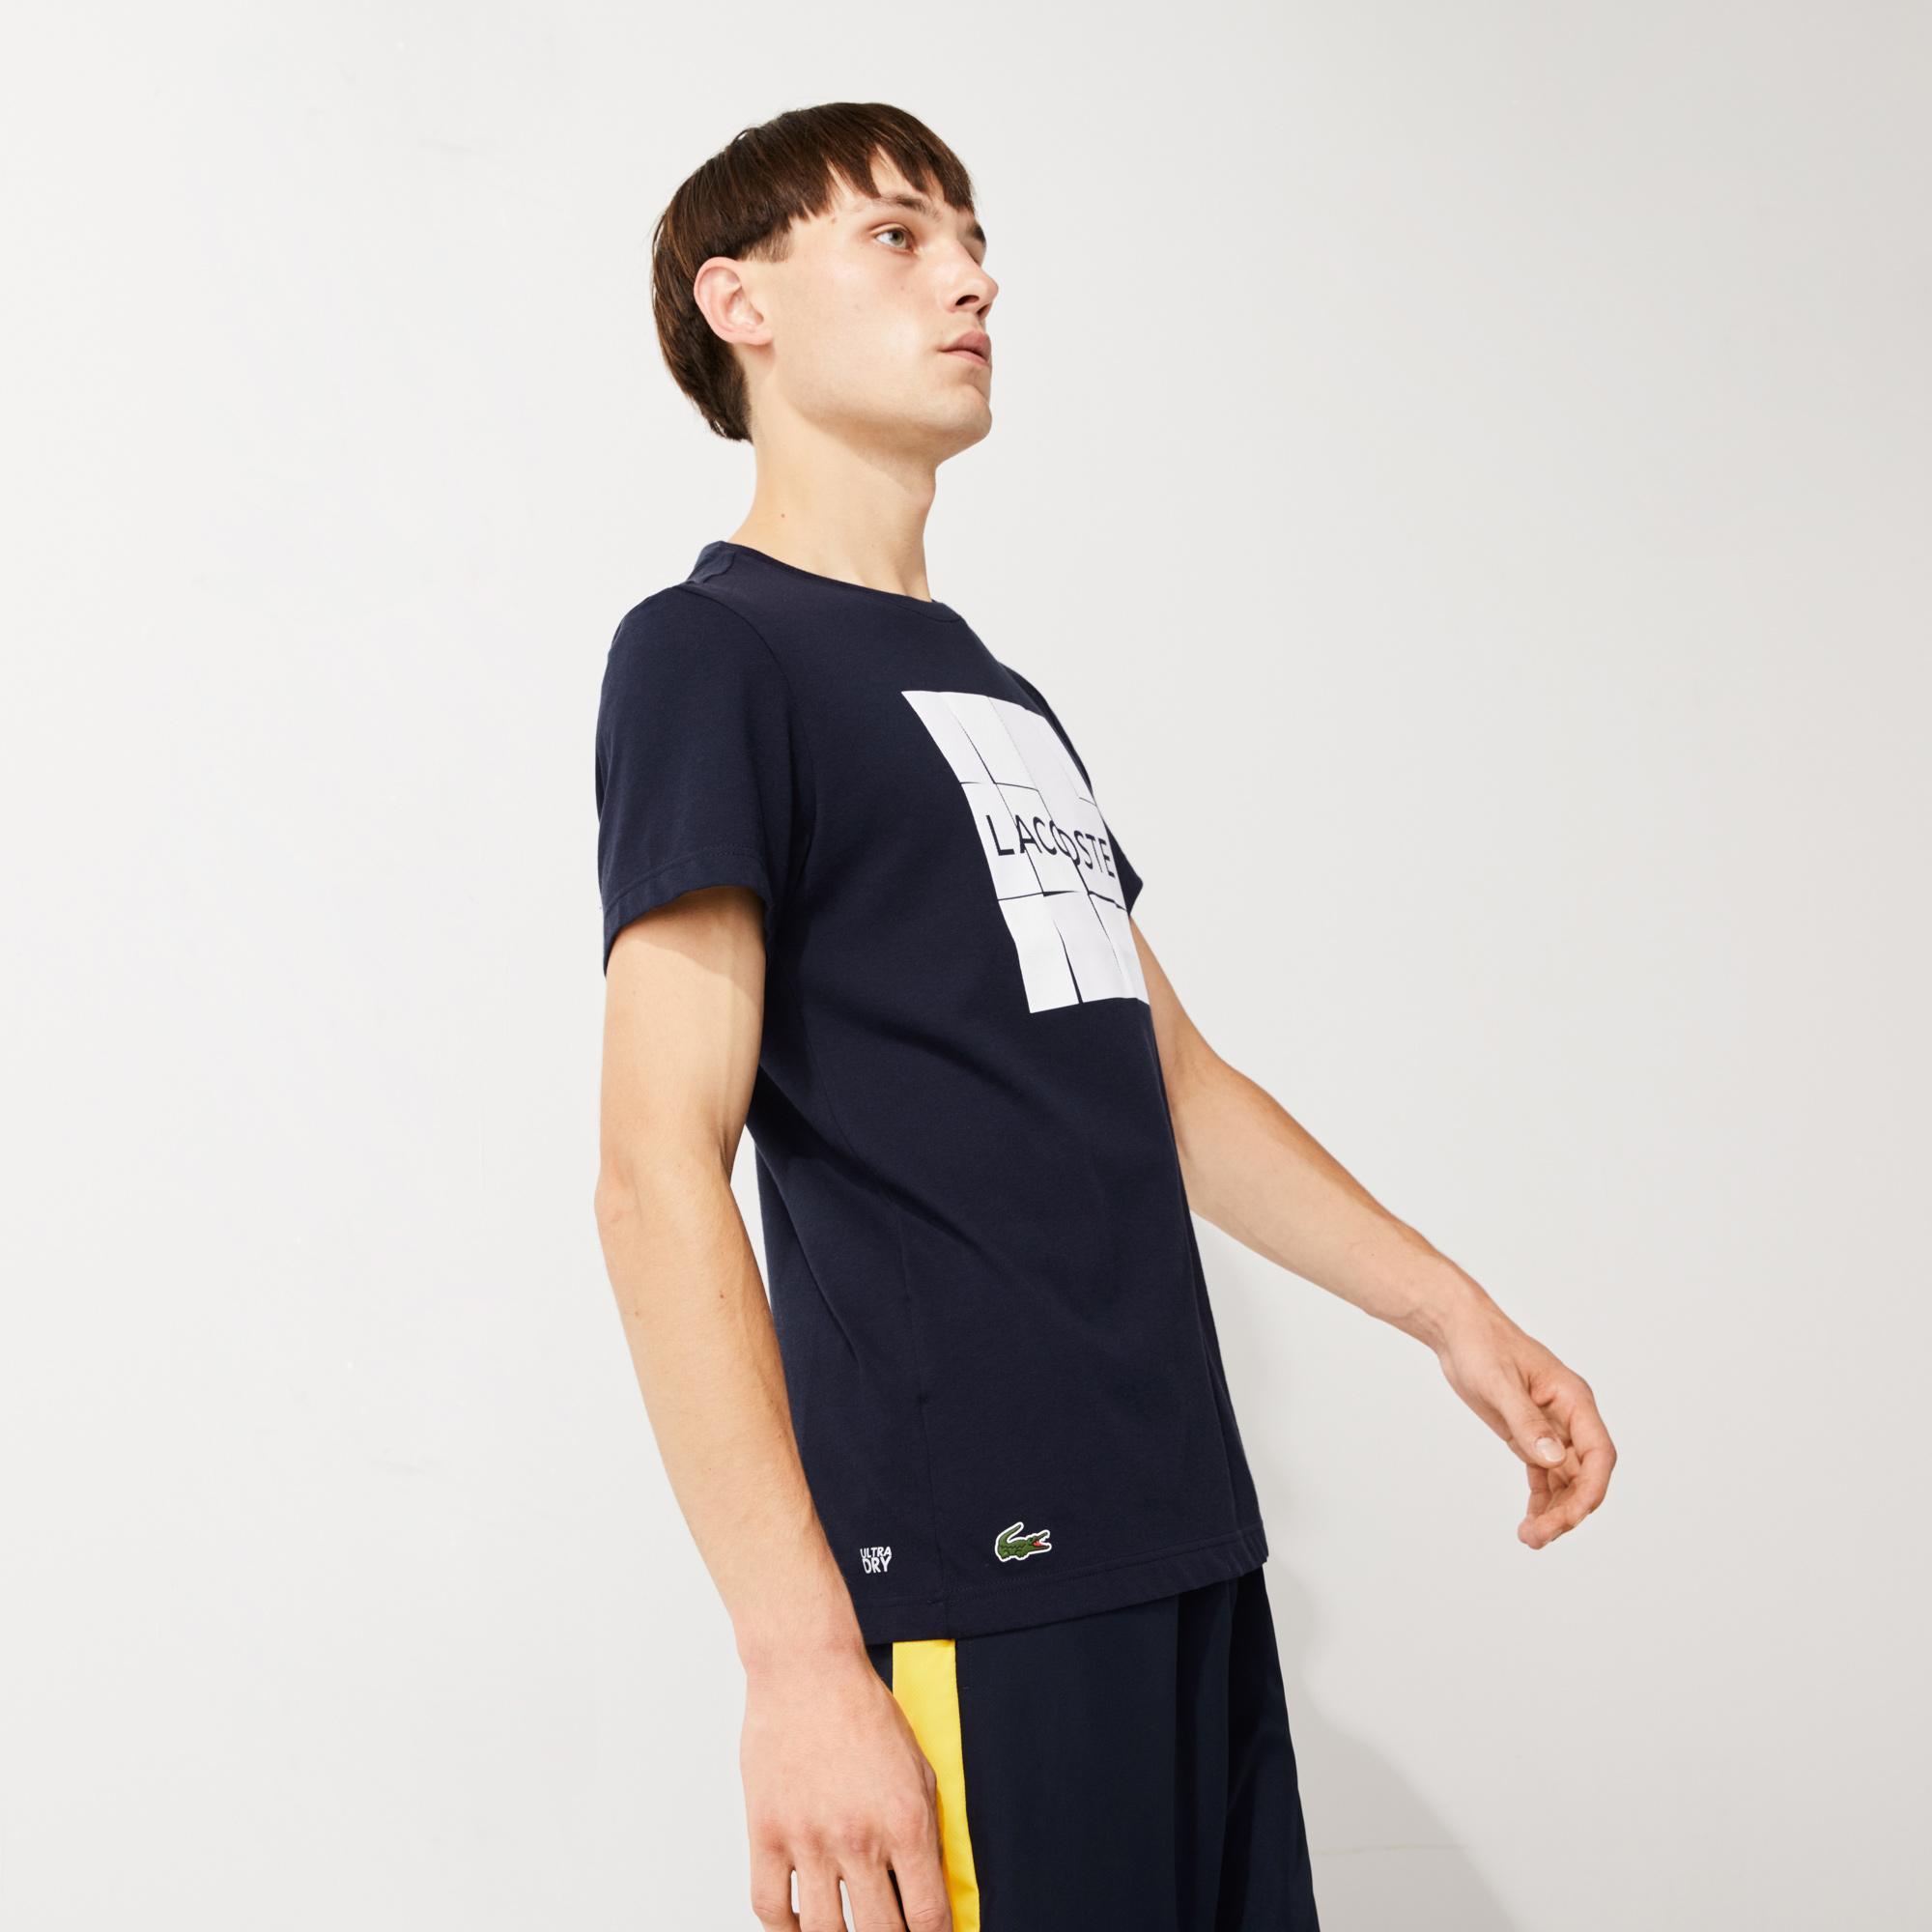 Lacoste Men's SPORT Graphic Print Breathable Jersey T-shirt